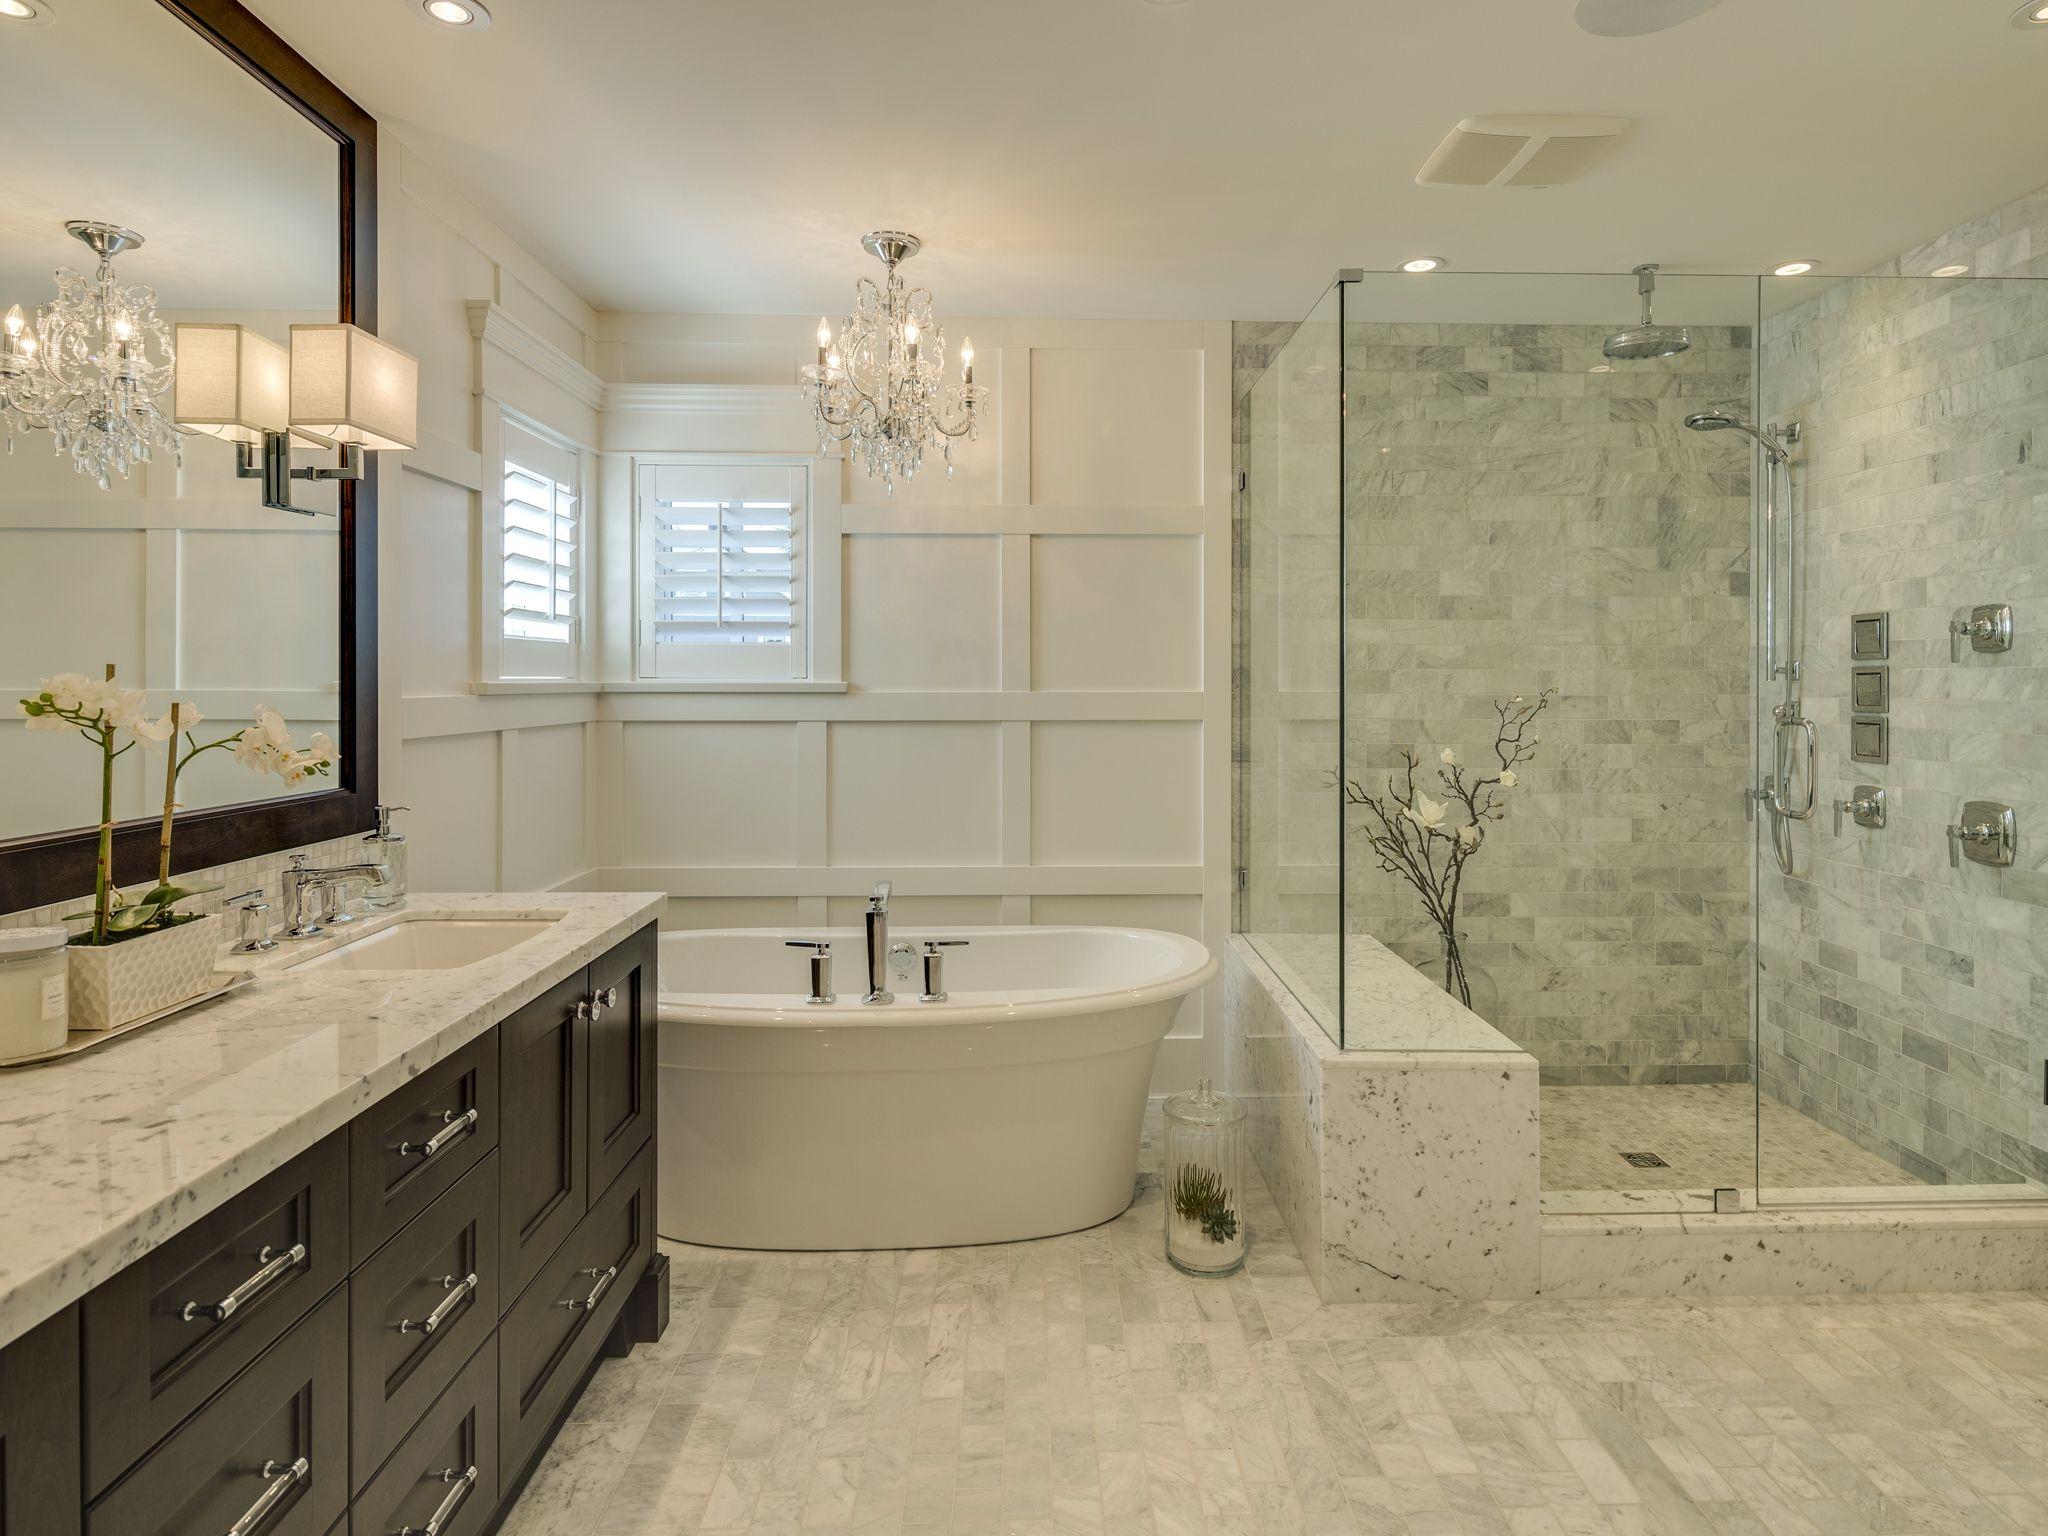 Image Result For Bathroom Lighting Ideas Modern Bathroom Design Master Bathroom Shower Bathrooms Remodel